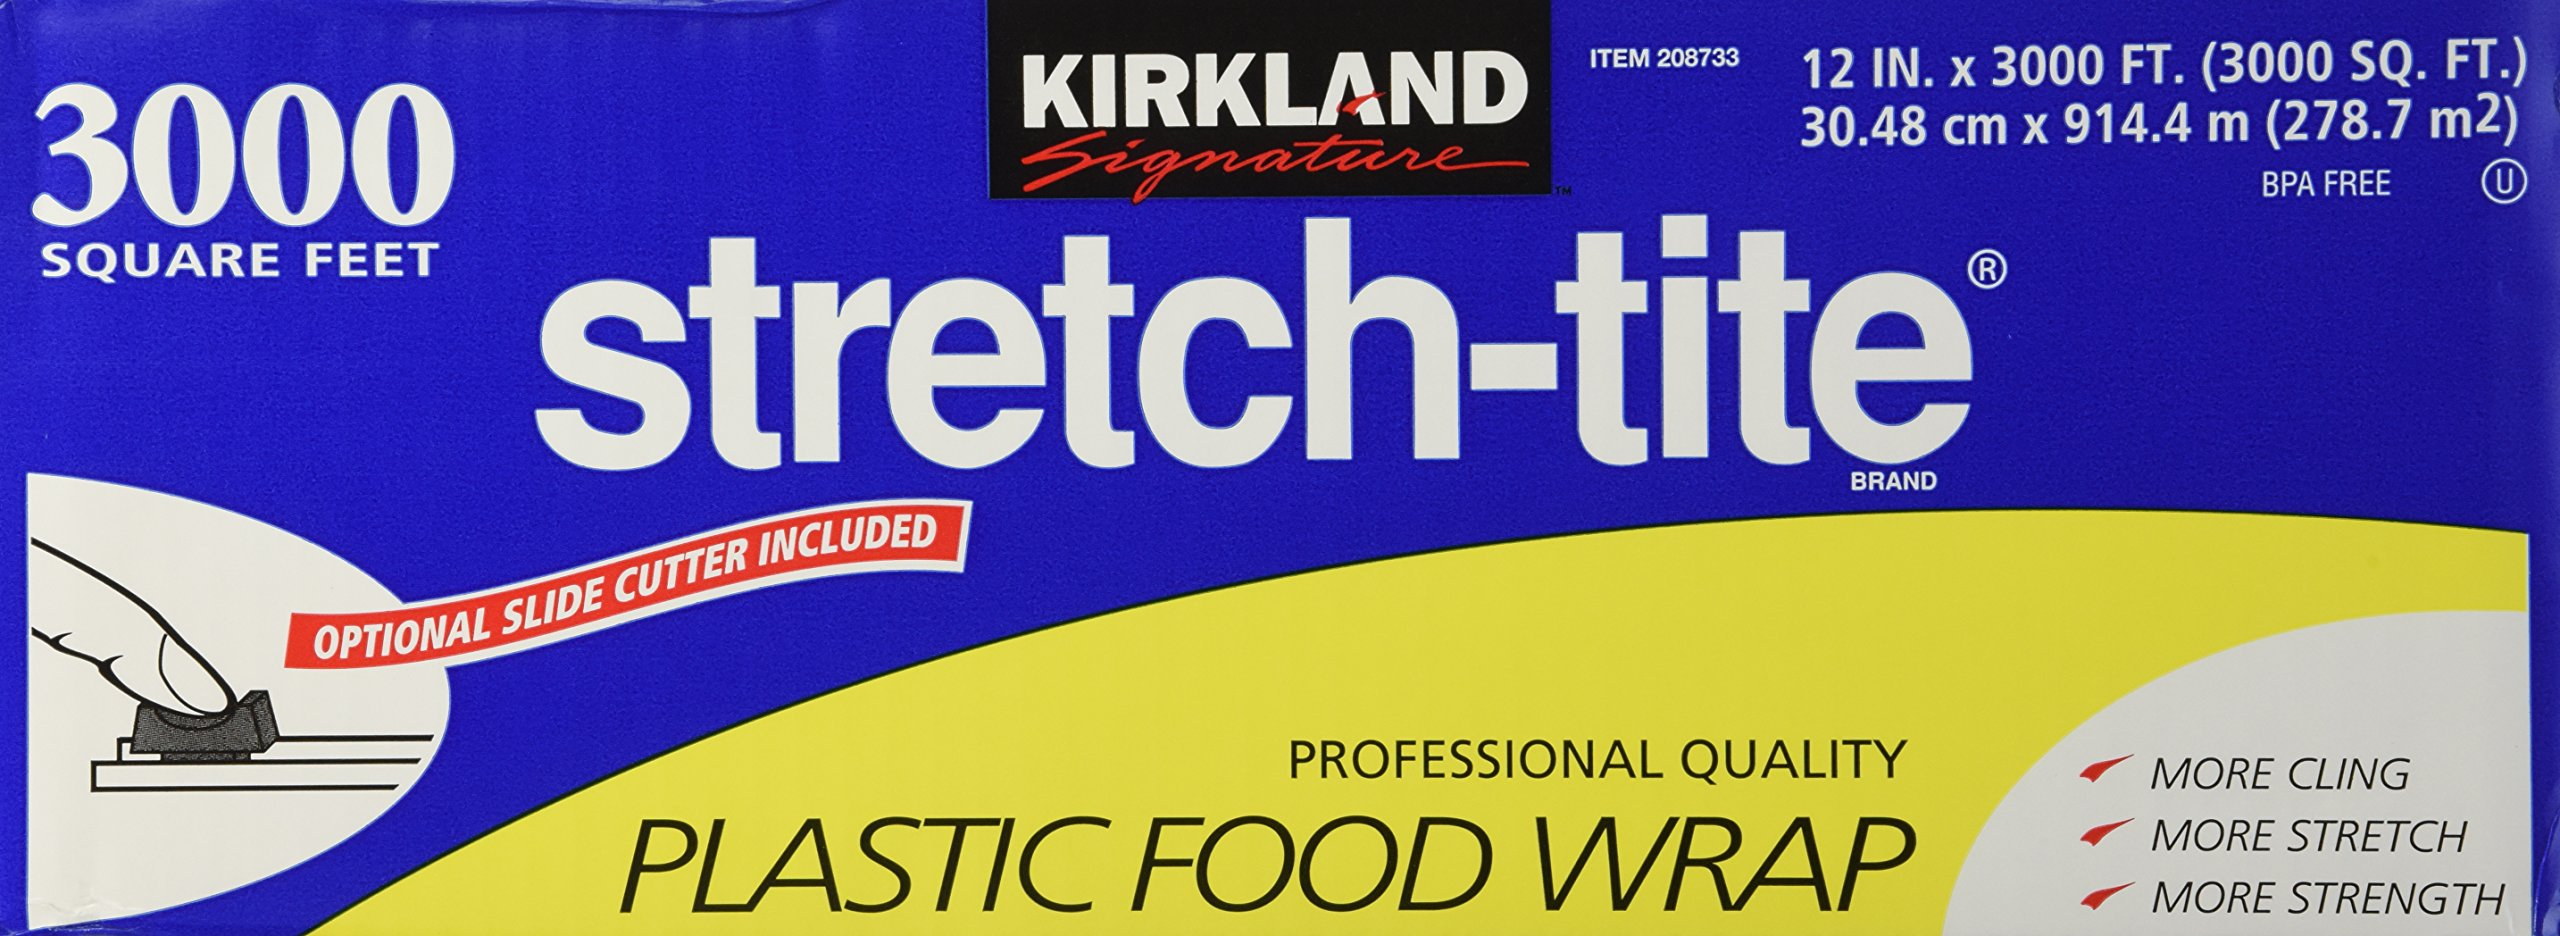 Stretch-tite 3000 sq. ft by Kirkland Signature